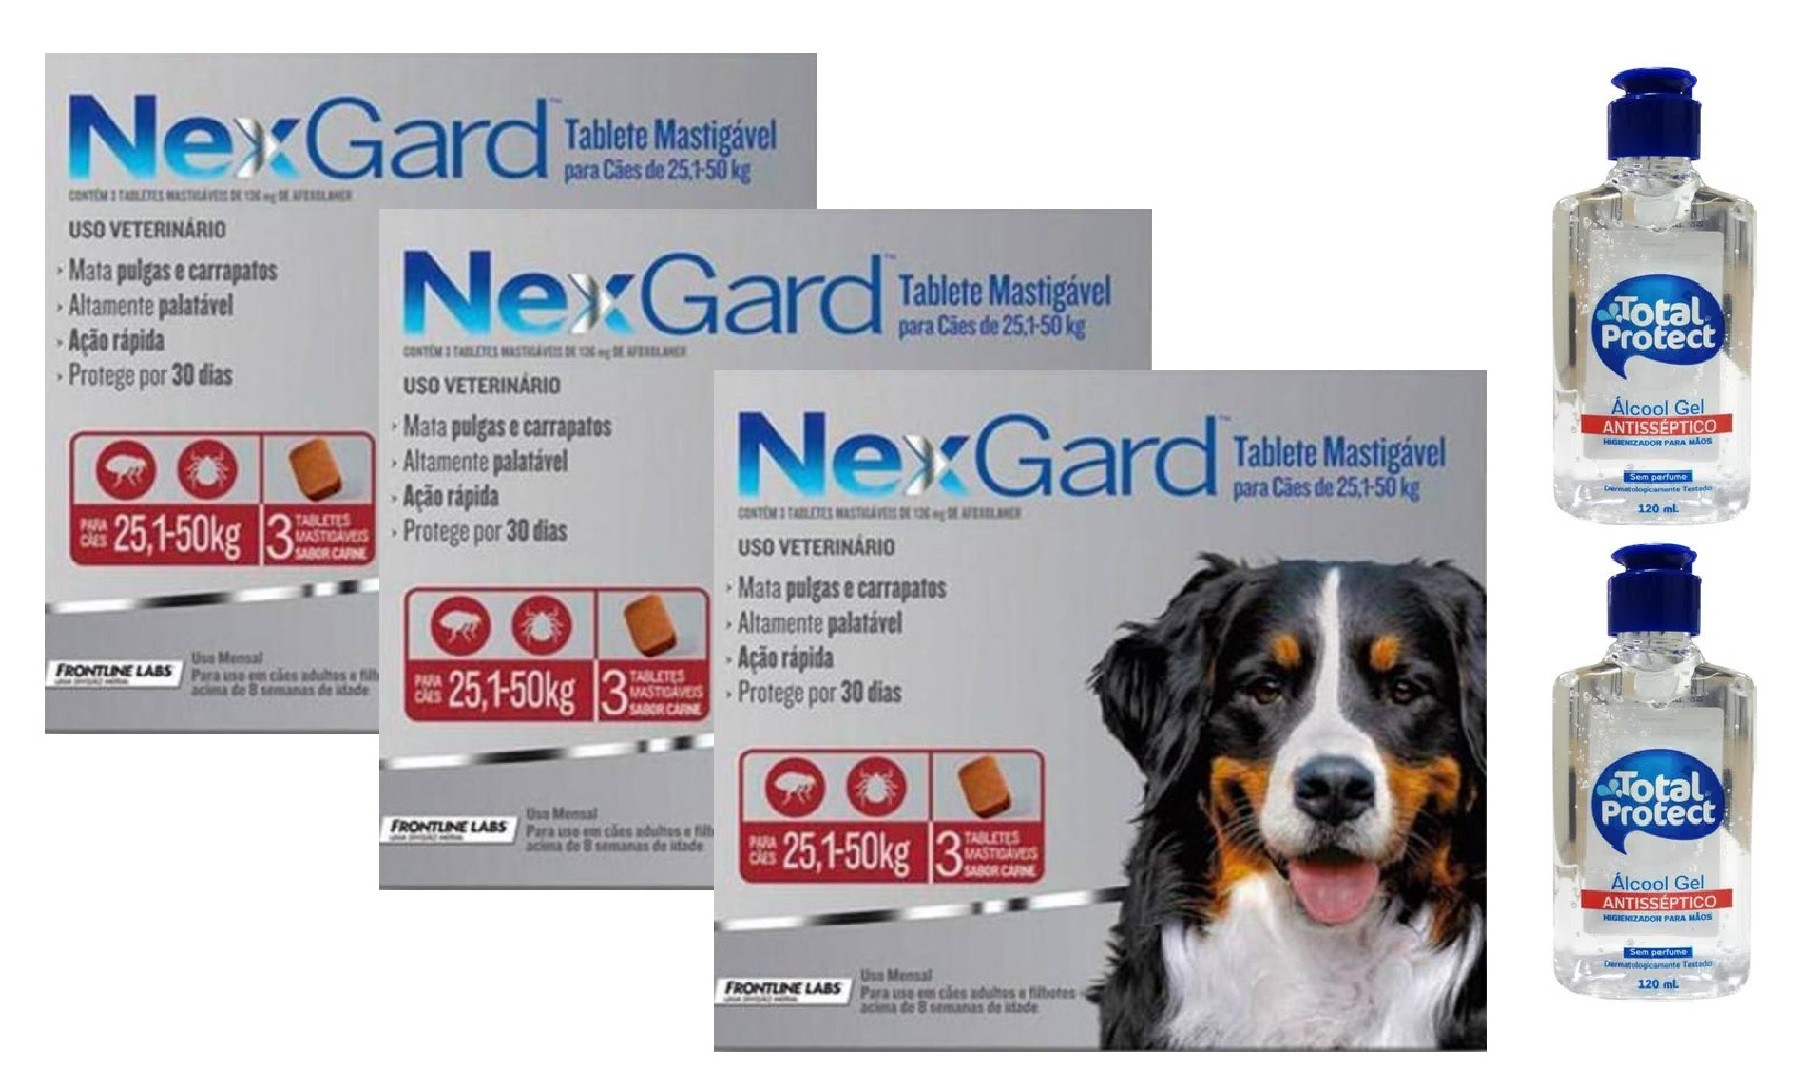 Kit 3 Unidades Antipulgas e Carrapatos Nexgard 136mg para Cães de 25,1 a 50kg (3 tabletes) - Merial + Brinde 2 Álcool Gel 120ml Total Protect